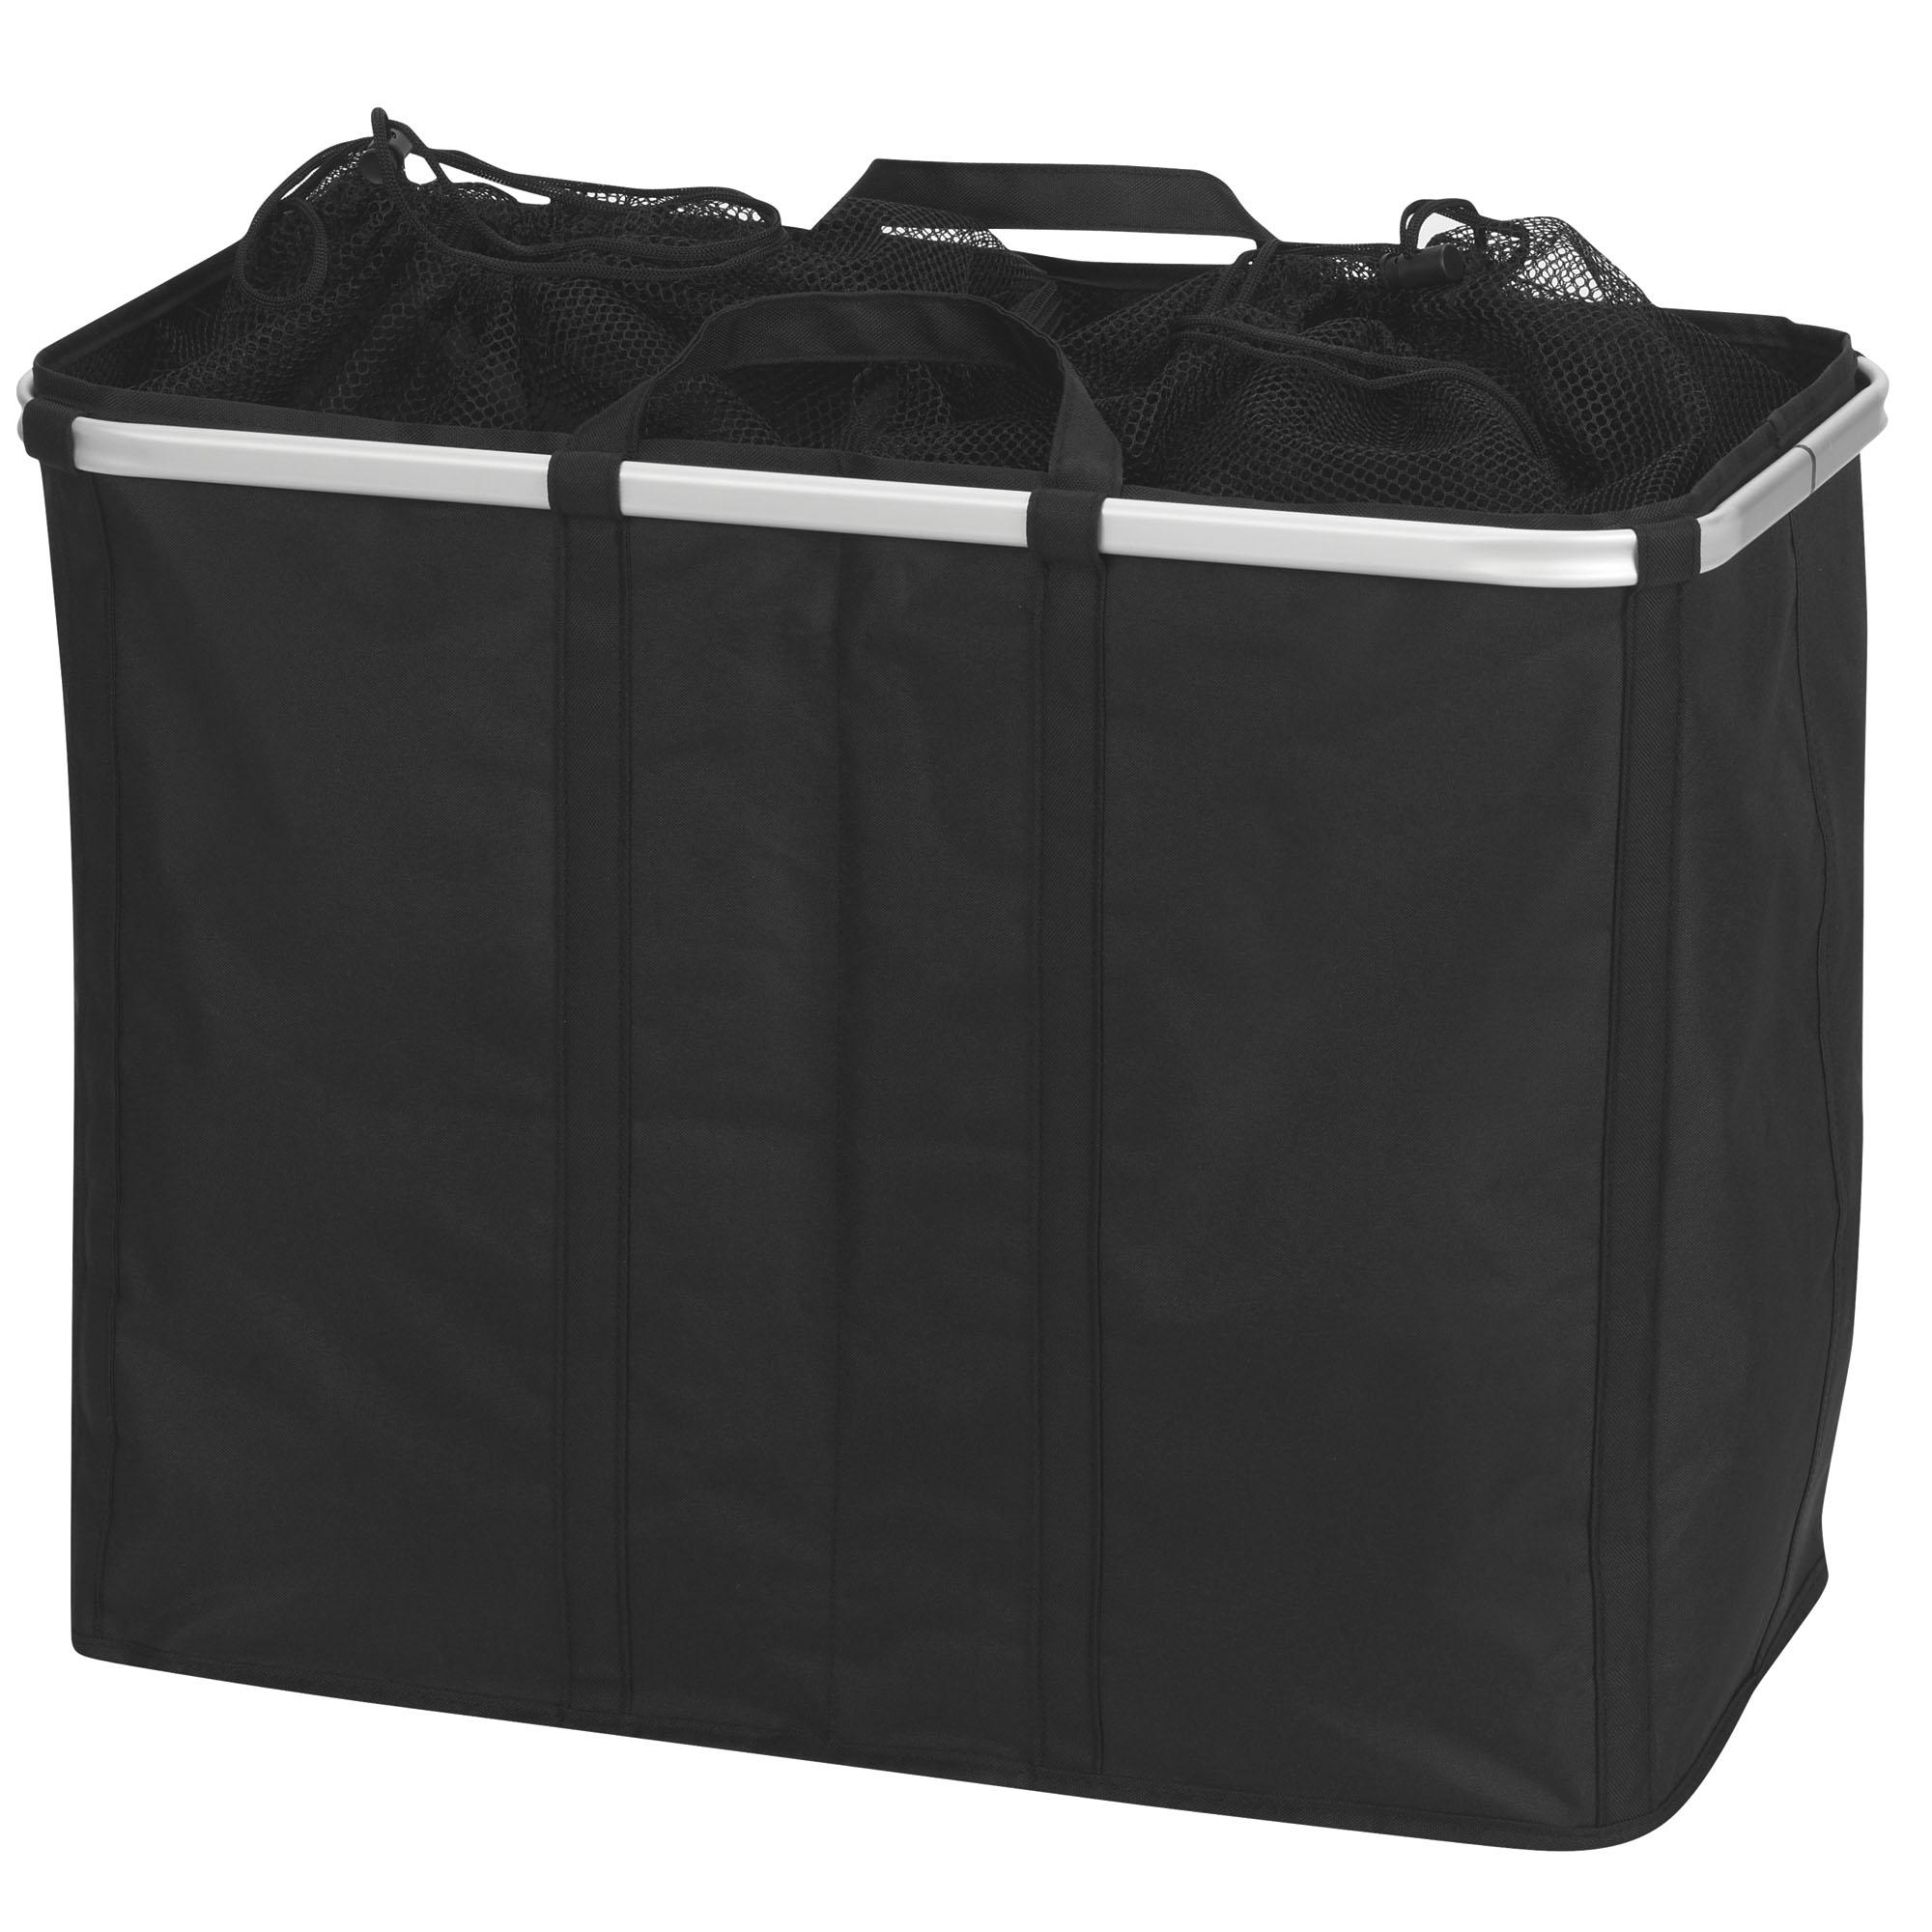 Twin Krush Aluminum Rim Sorter - Black